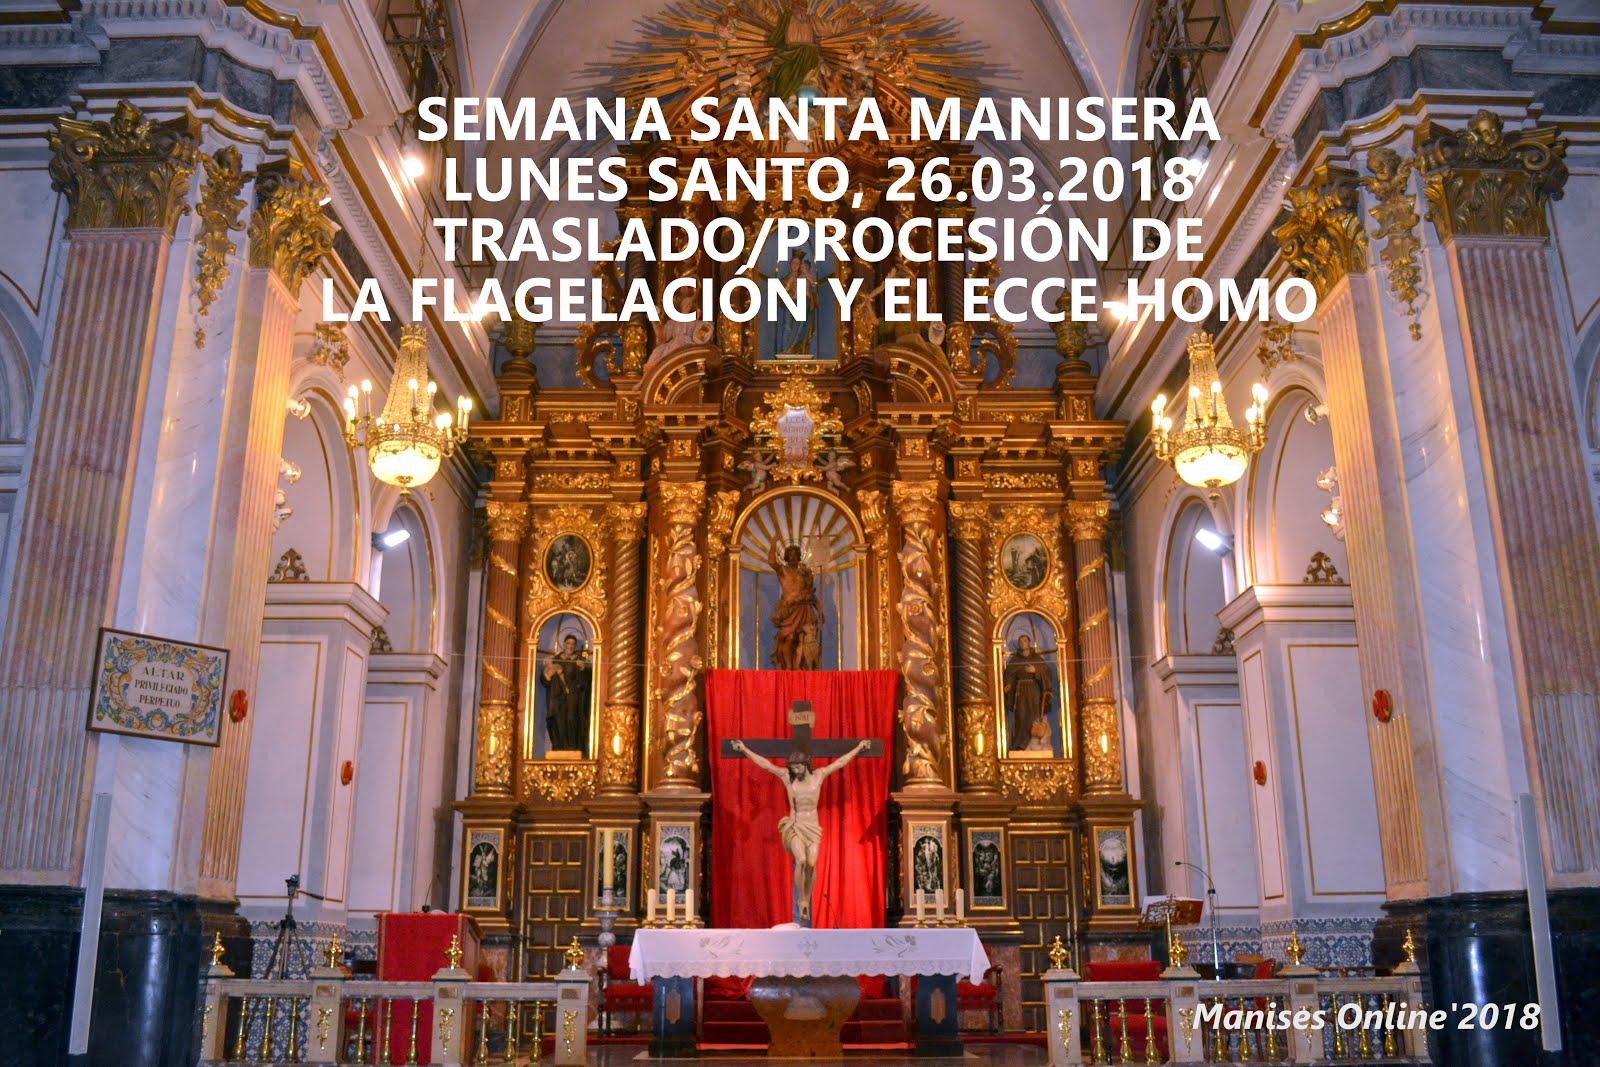 26.03.18 SEMANA SANTA MANISERA 2018: LUNES SANTO